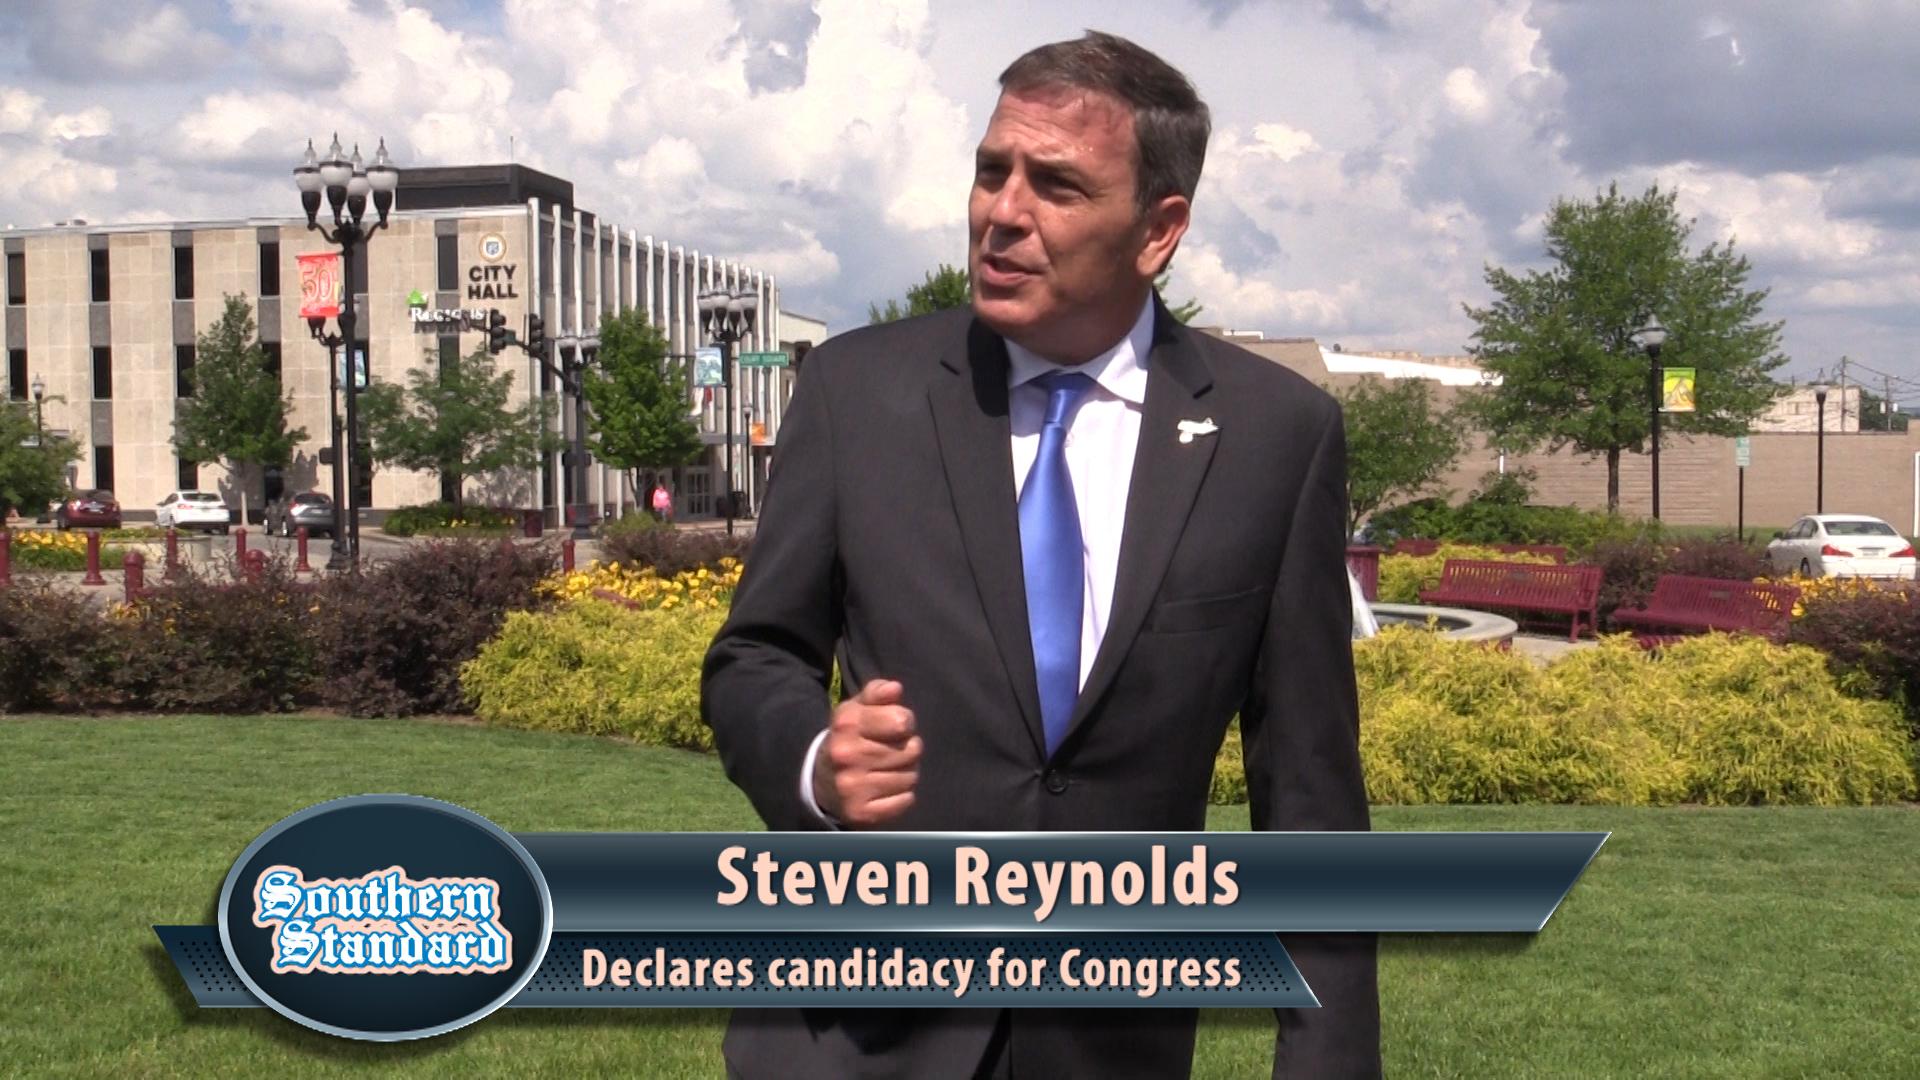 Steven Reynolds declares for Congress